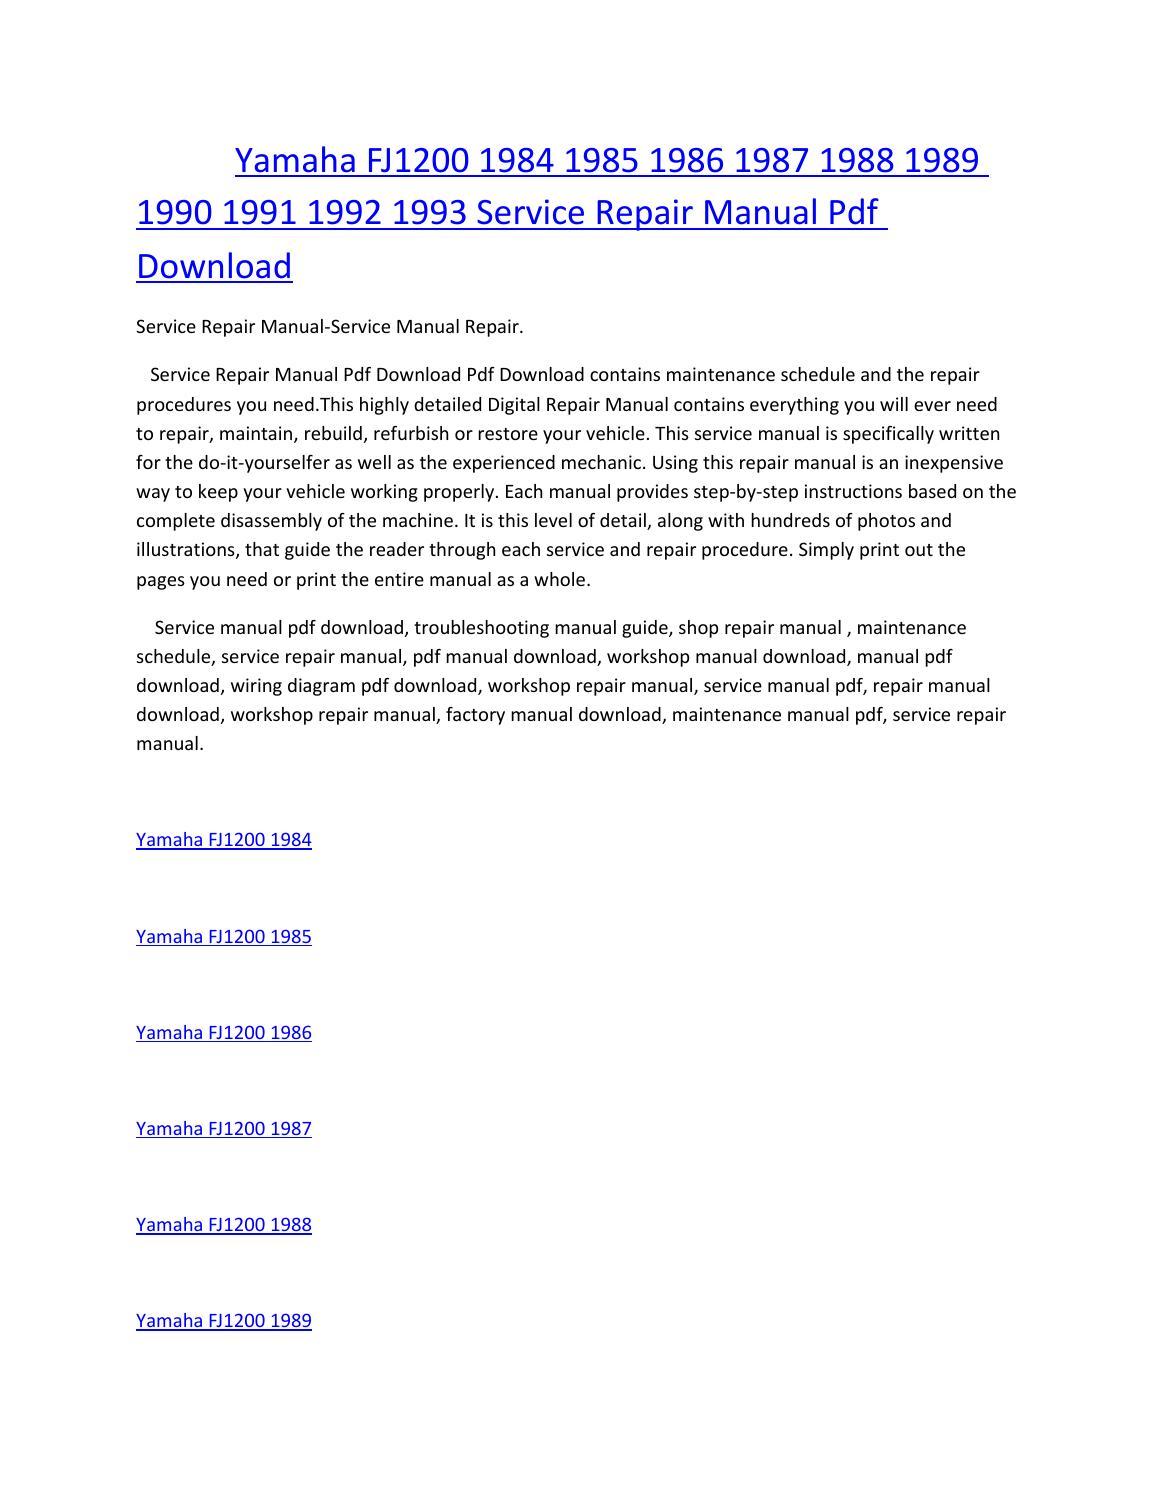 Yamaha fj1200 1984 1985 1986 1987 1988 1989 1990 1991 1992 1993 service  manual repair pdf download by amurgului - issuu